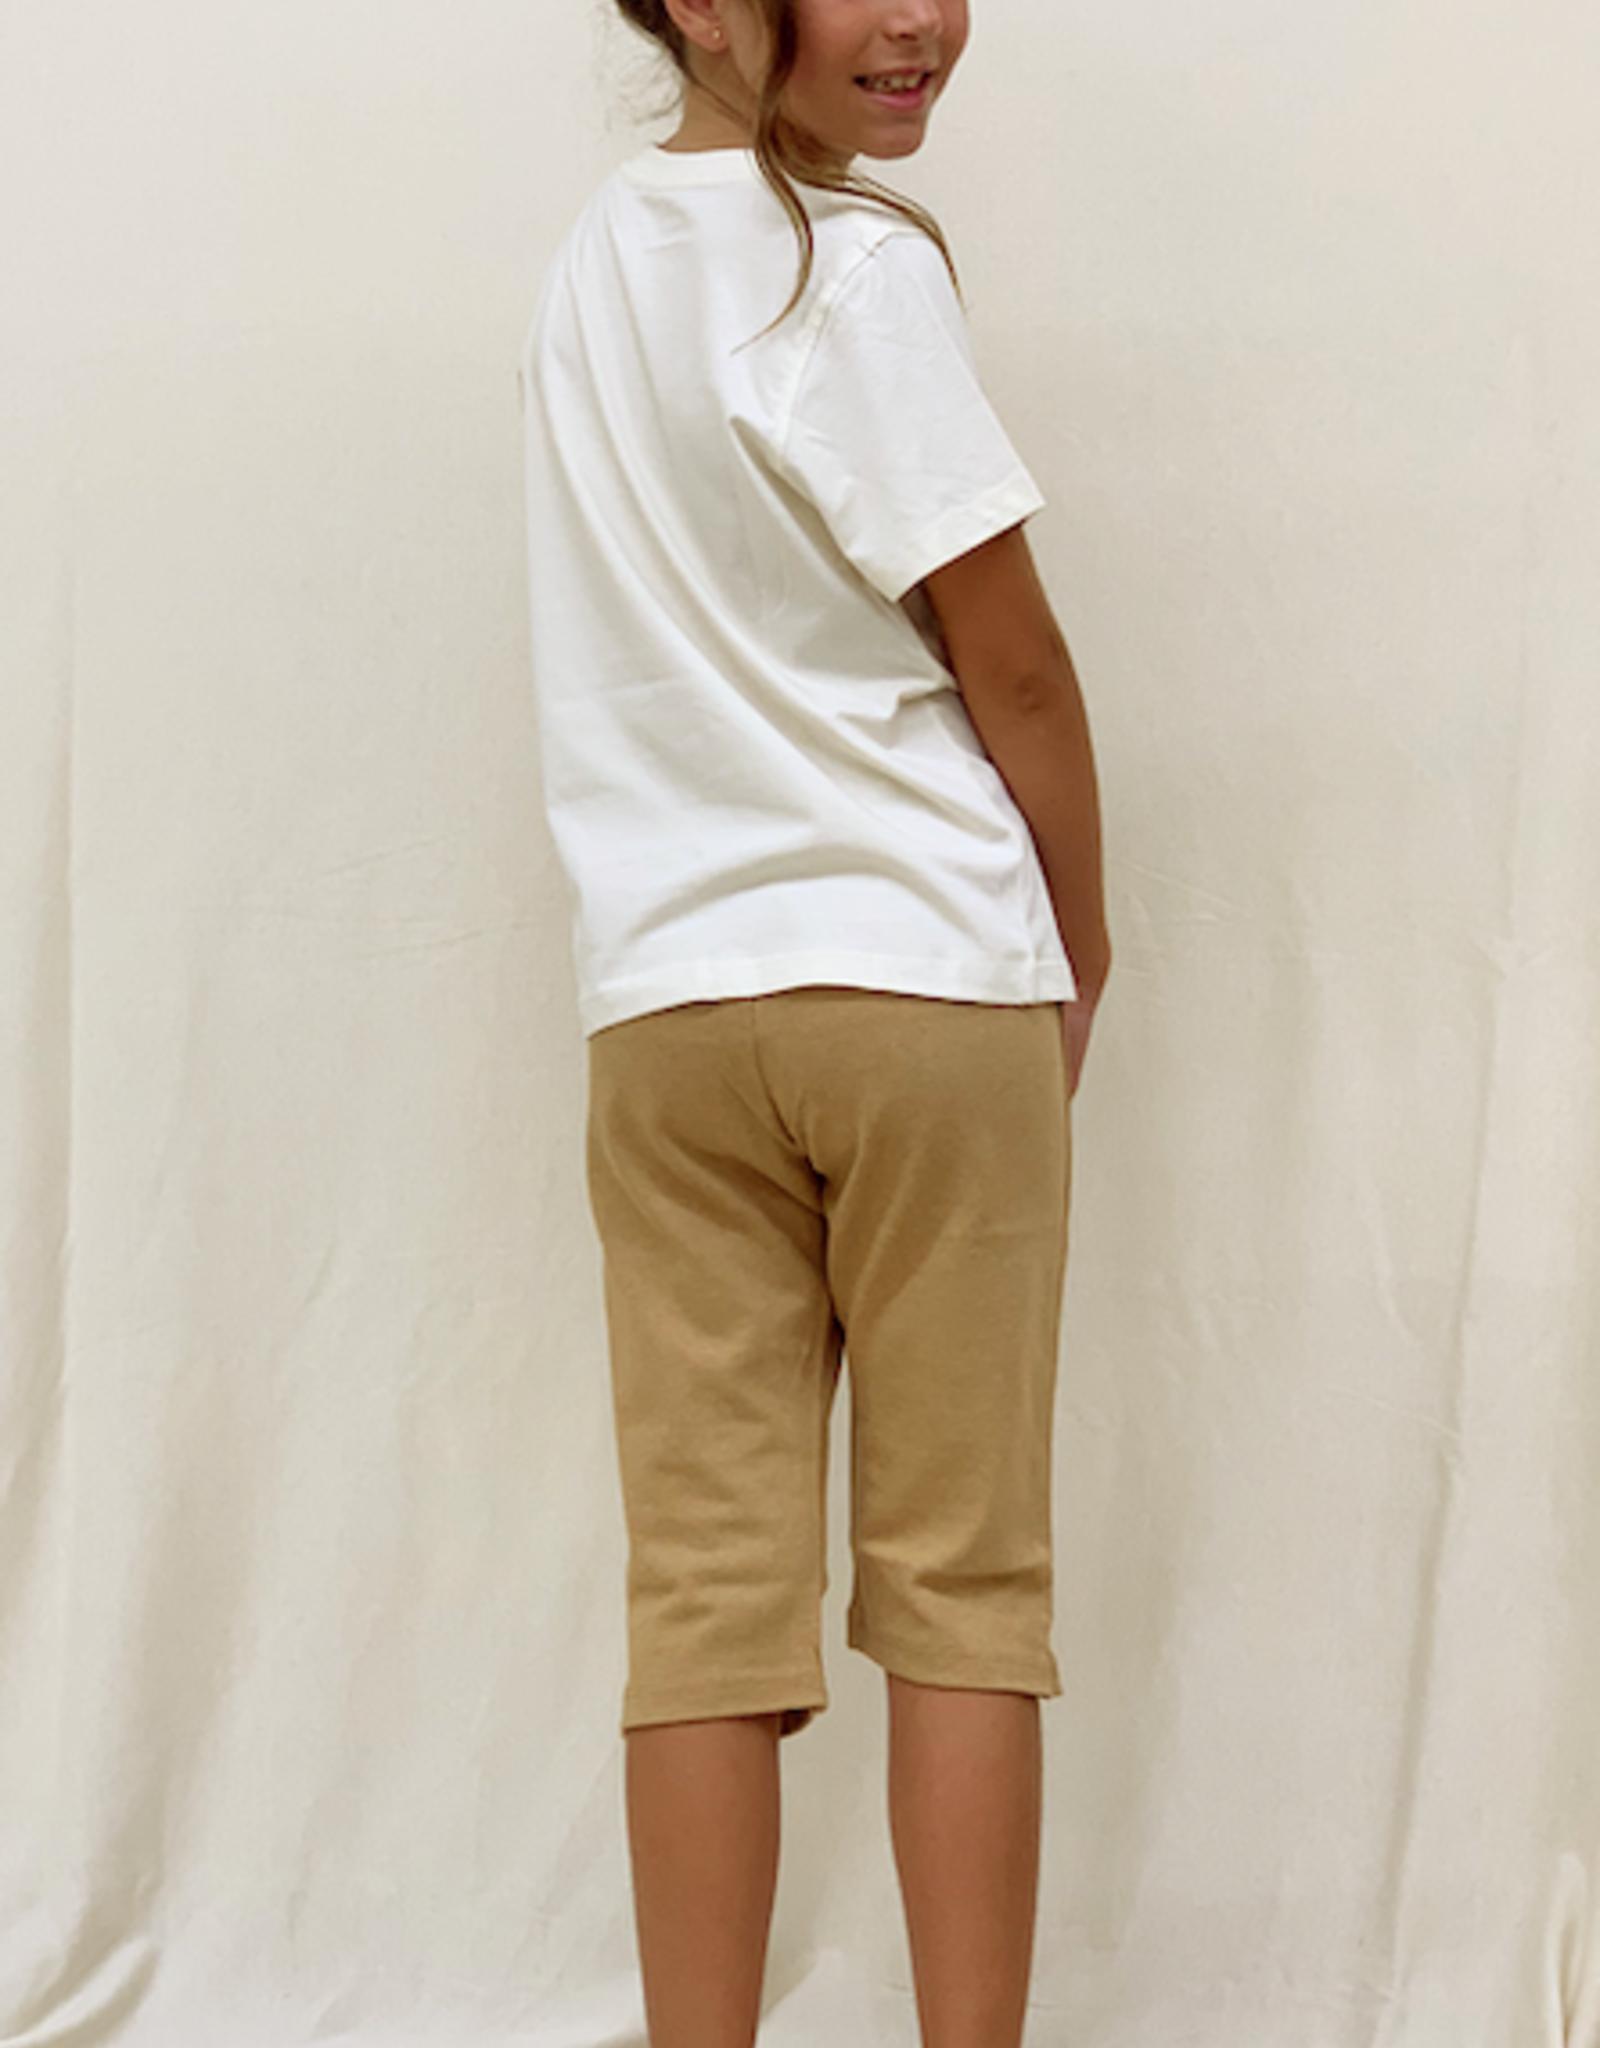 Camiseta junior listada manga corta. Tallas 2, 4, 6 años.